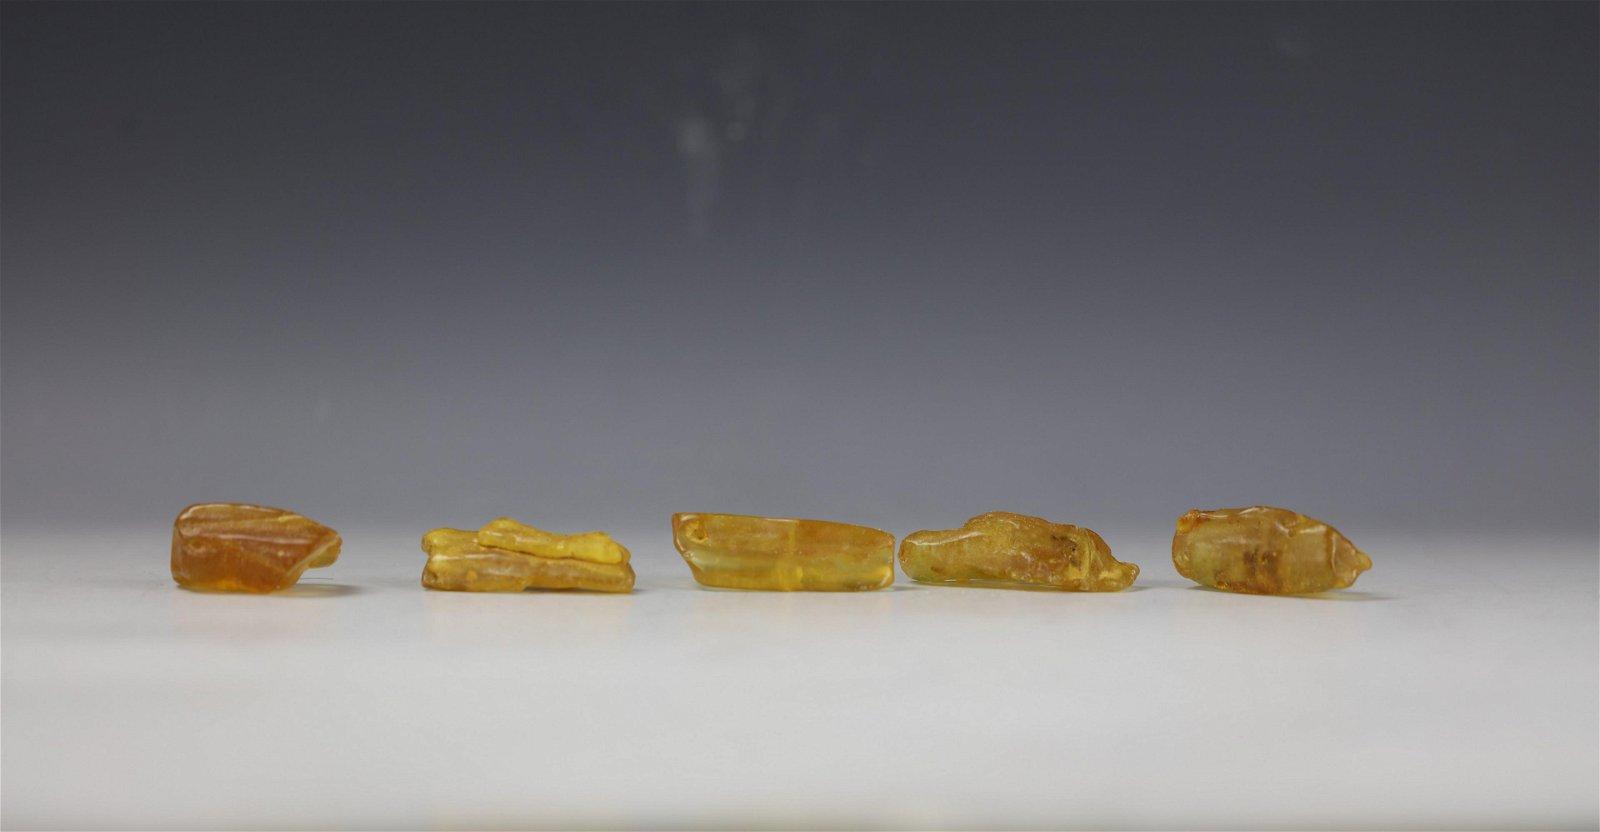 Five Natural Amber Nugets